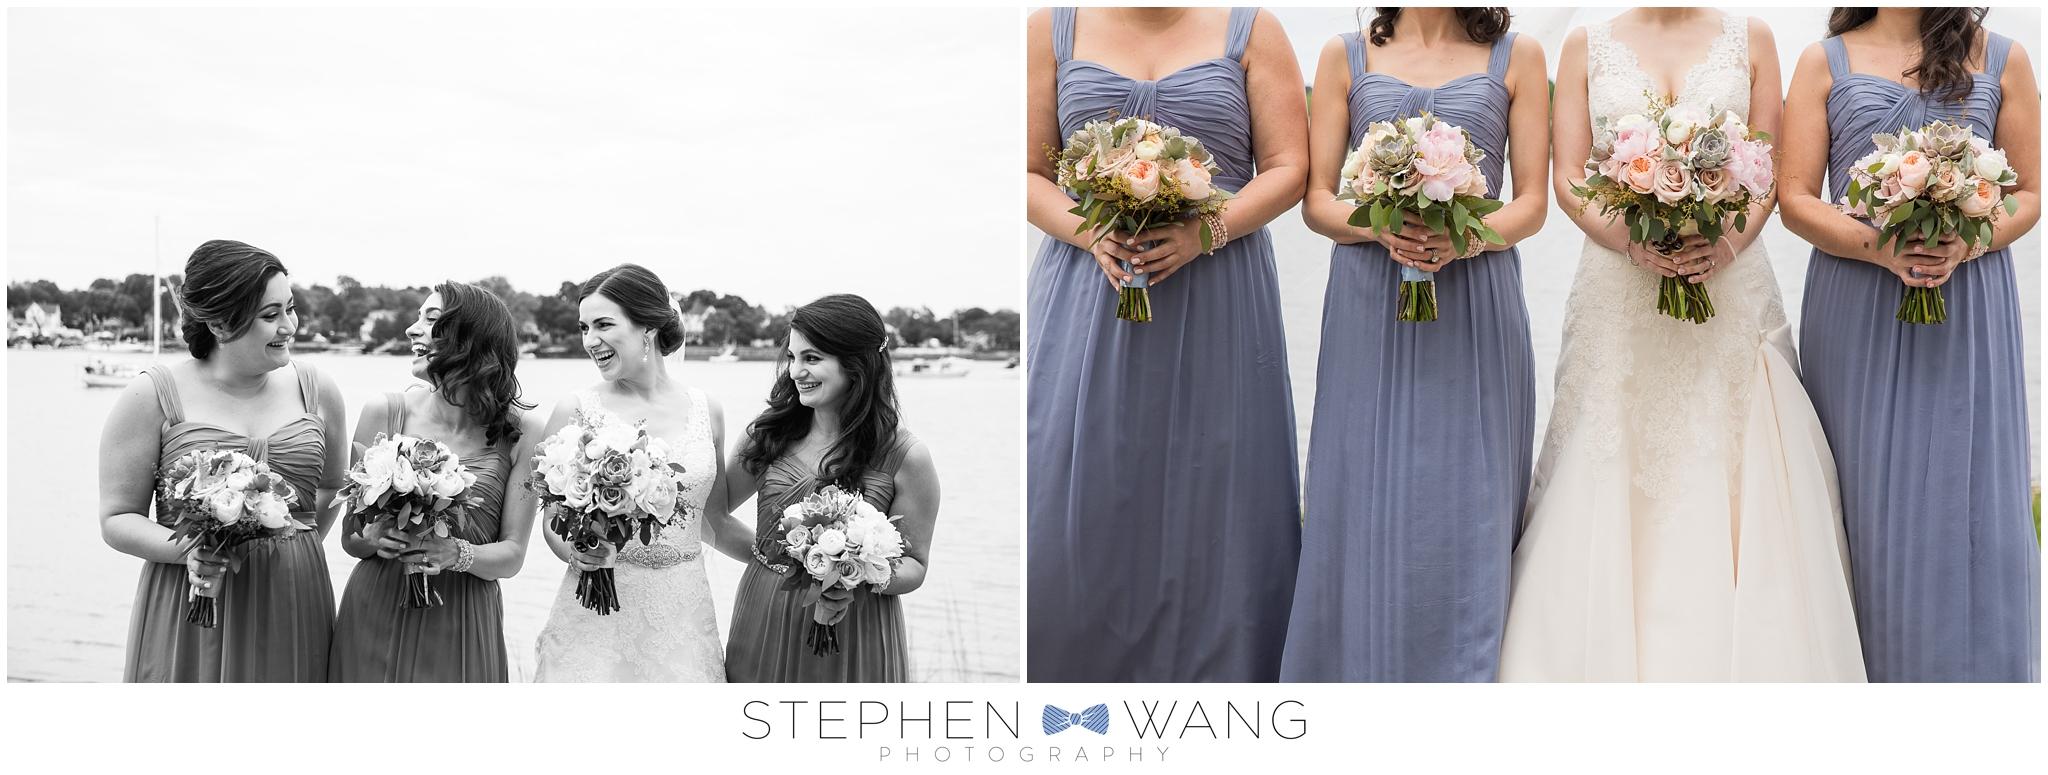 Stephen Wang Photography Shorehaven Norwalk CT Wedding Photographer connecticut shoreline shore haven - 15.jpg